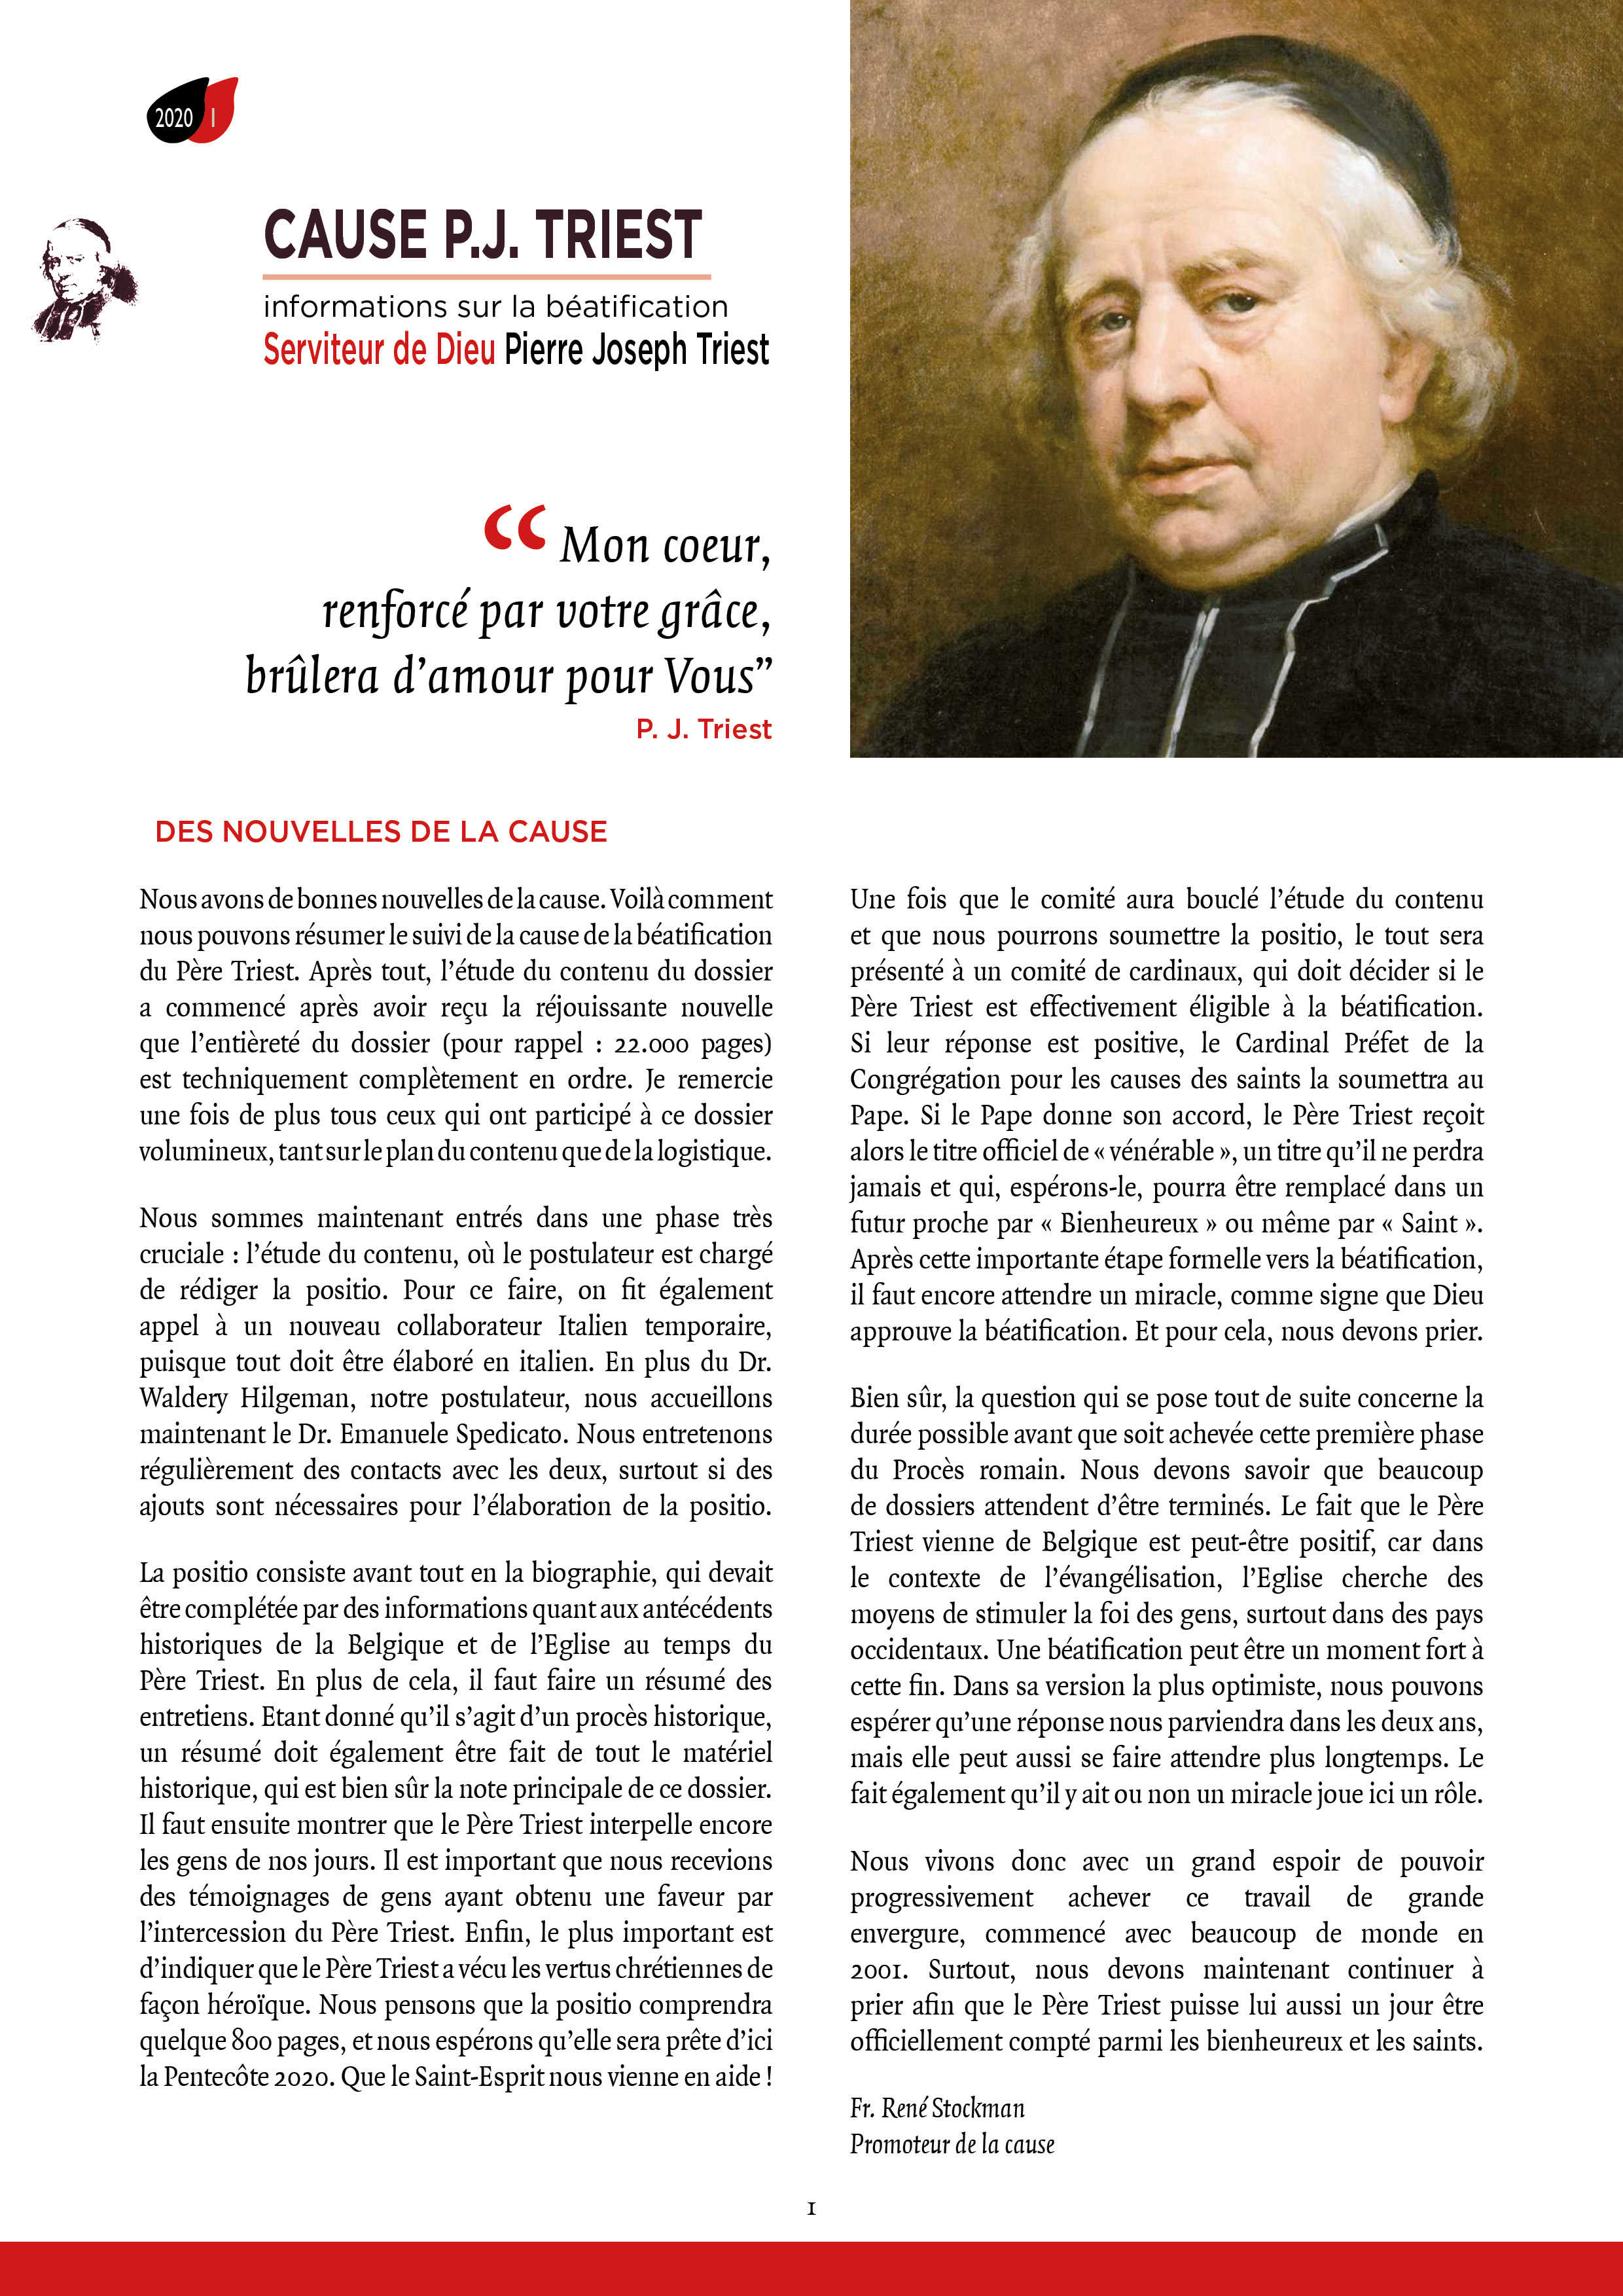 Bulletin d'information Cause P.J. Triest